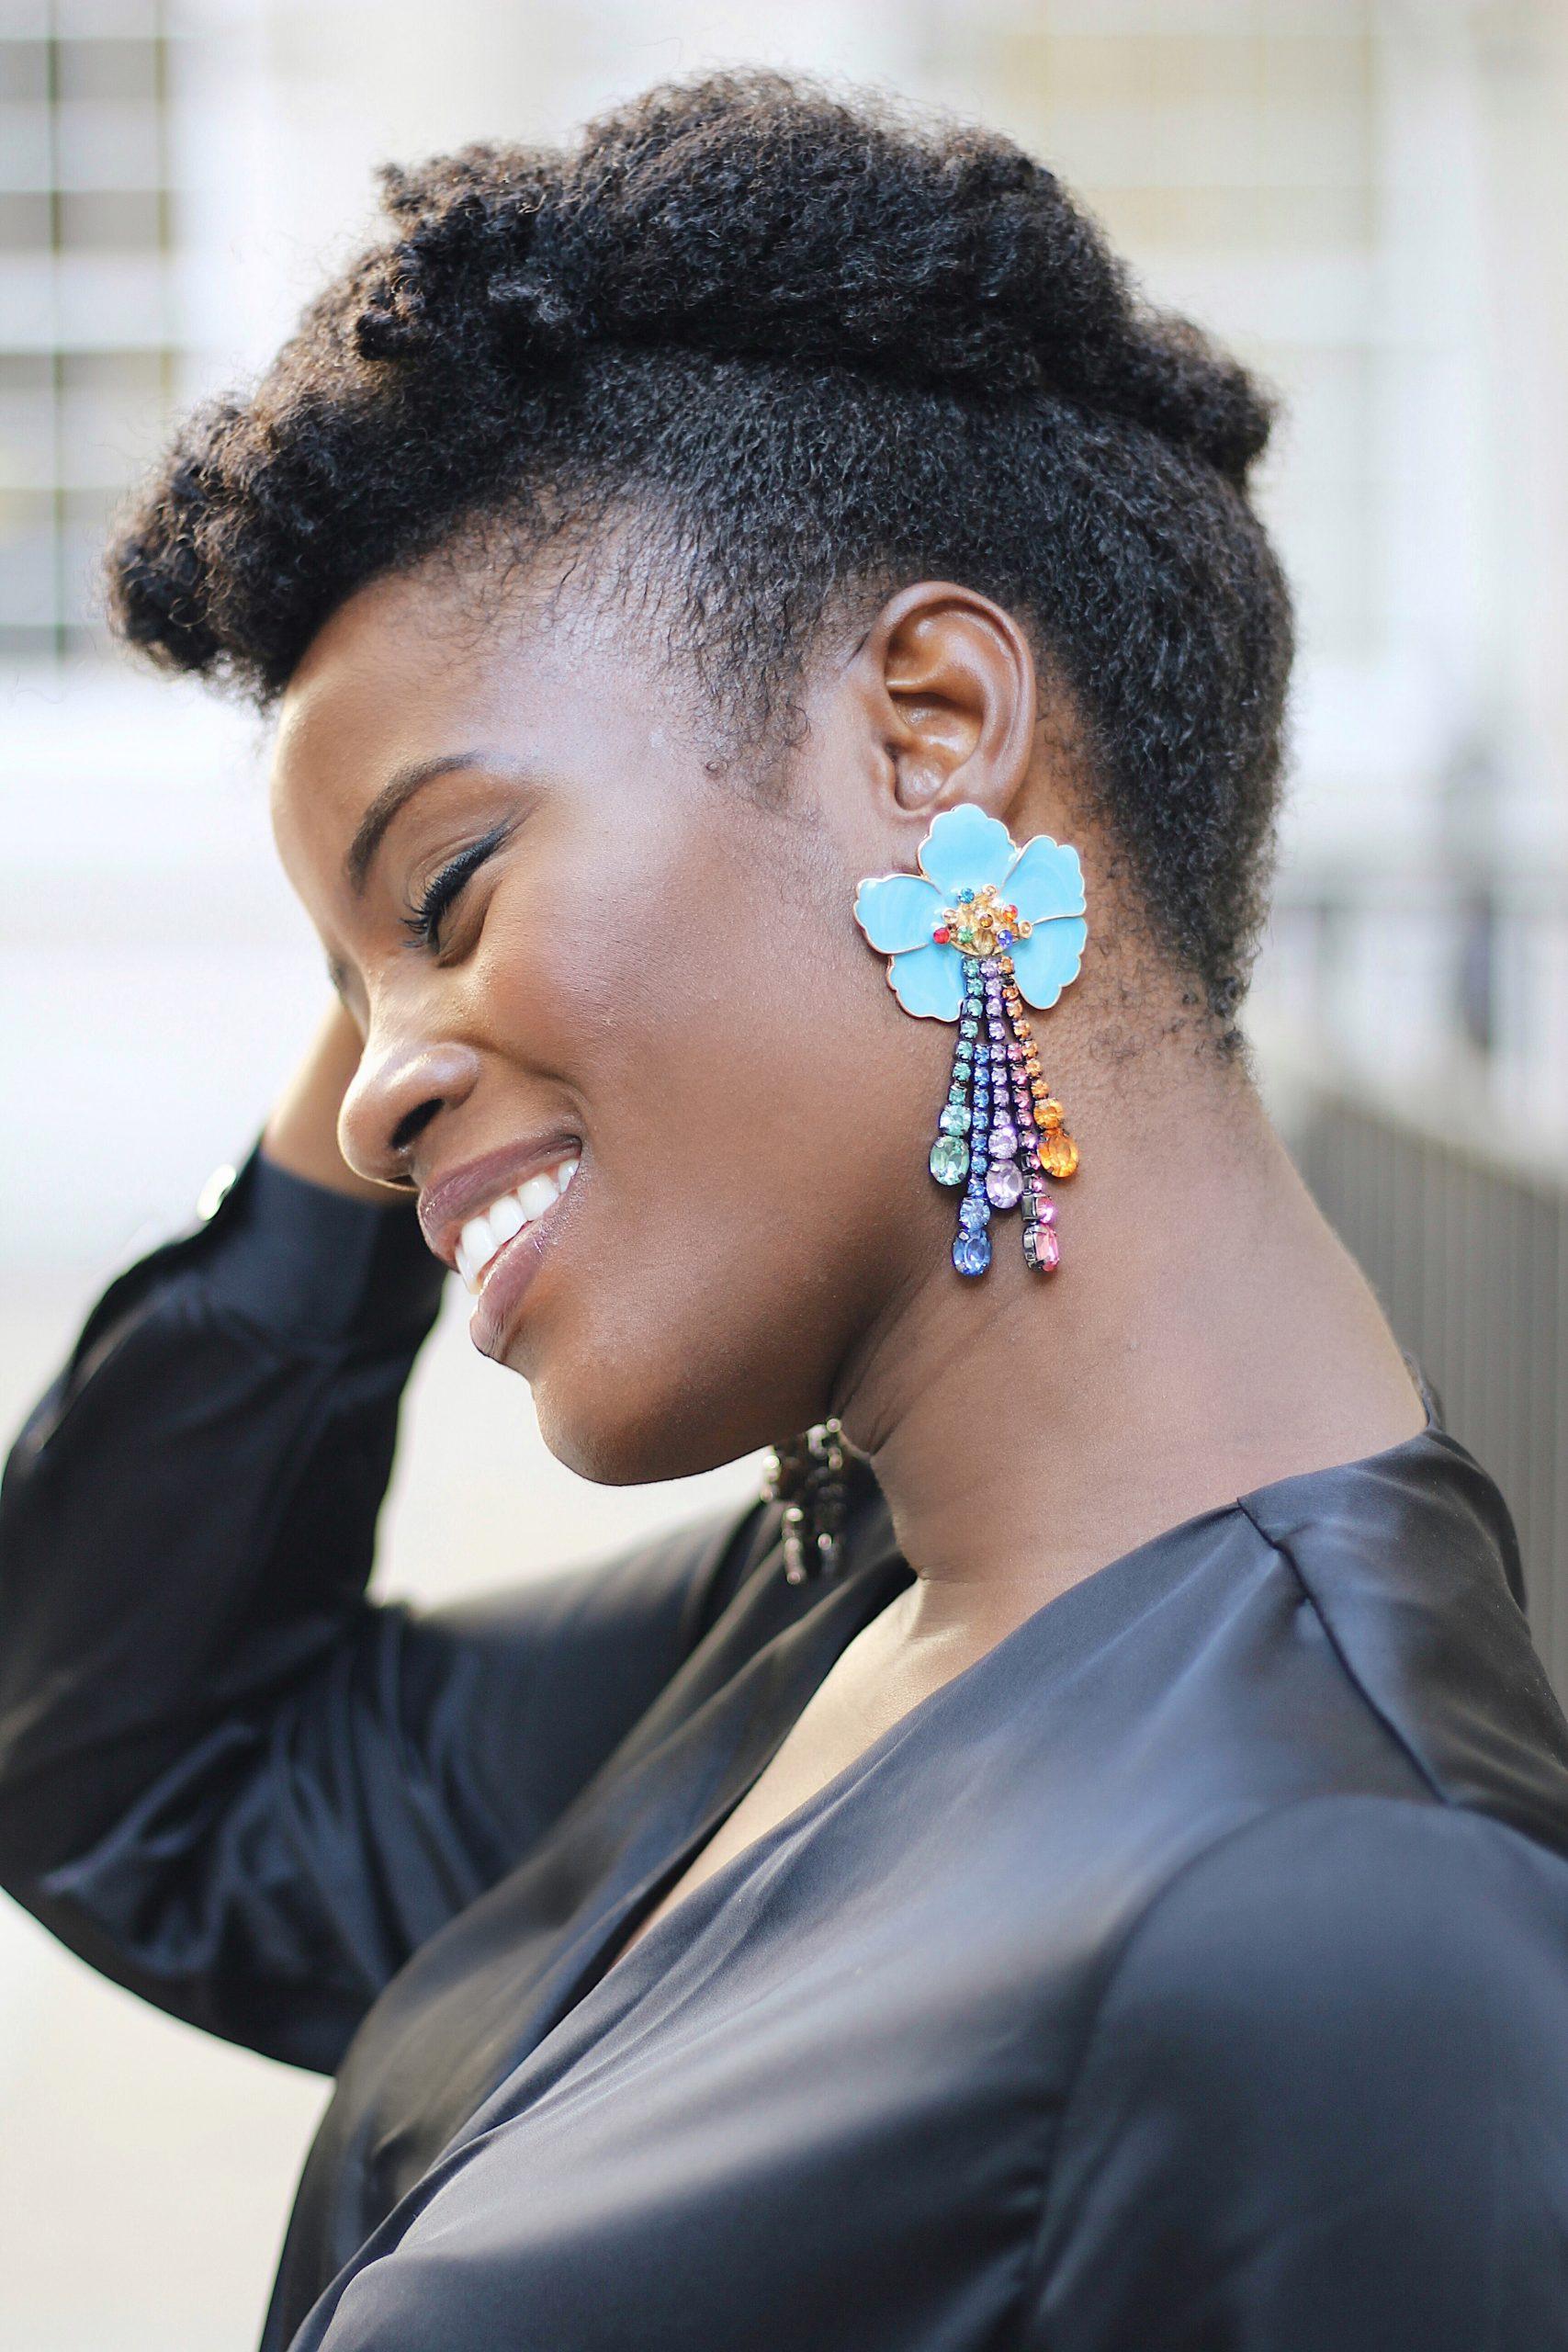 10 cheap statement earrings under $4